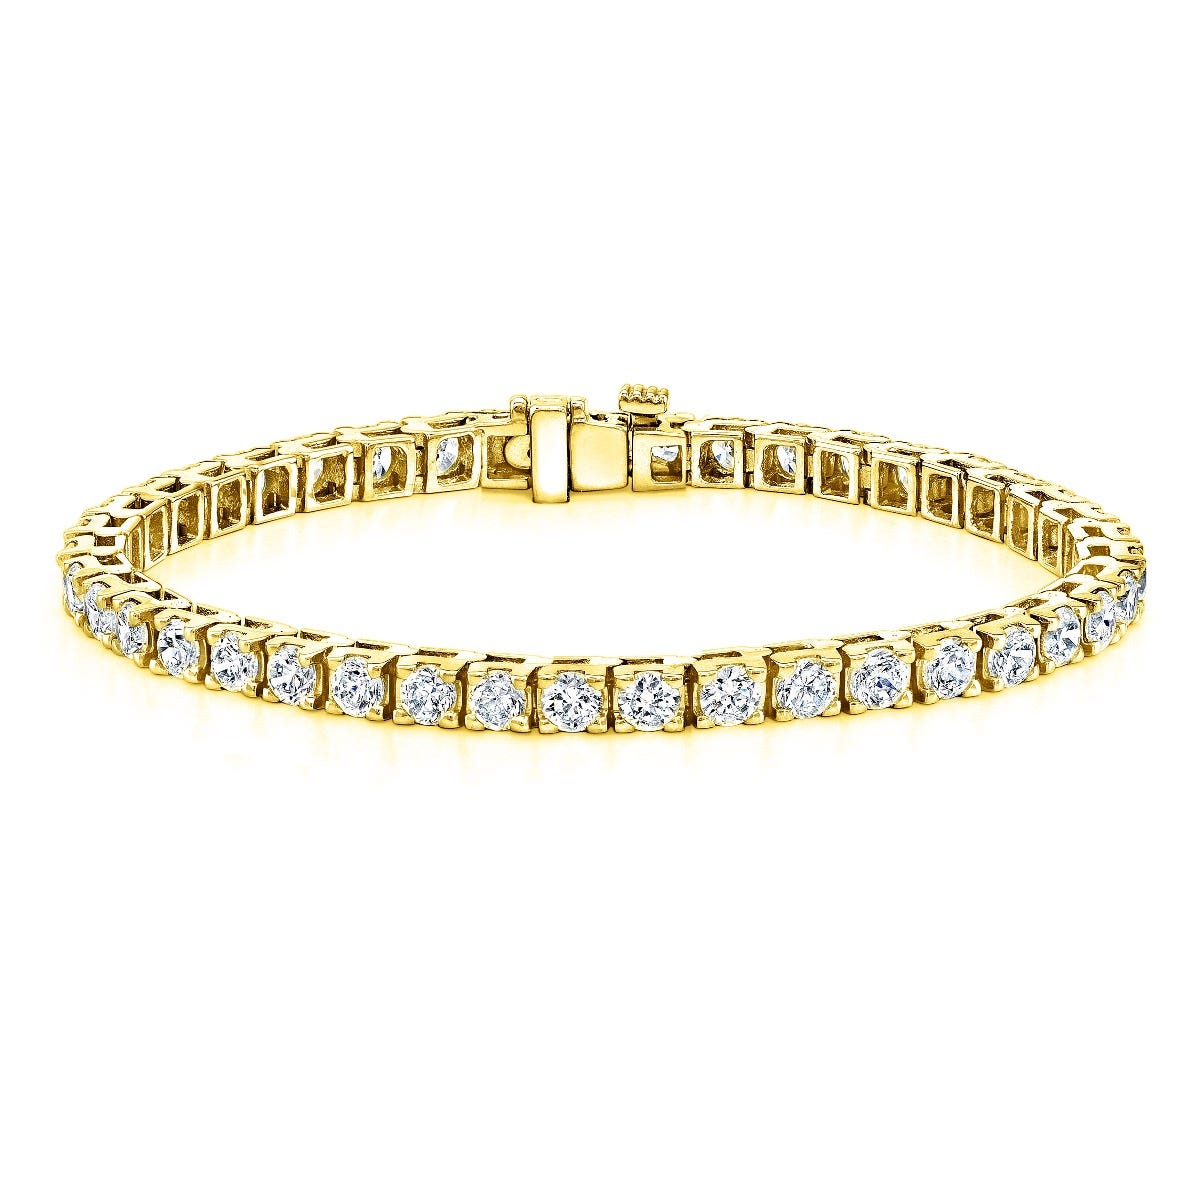 9ctw. 4-Prong Square Link Diamond Tennis Bracelet in 14K Yellow Gold (HI, SI1-SI2)